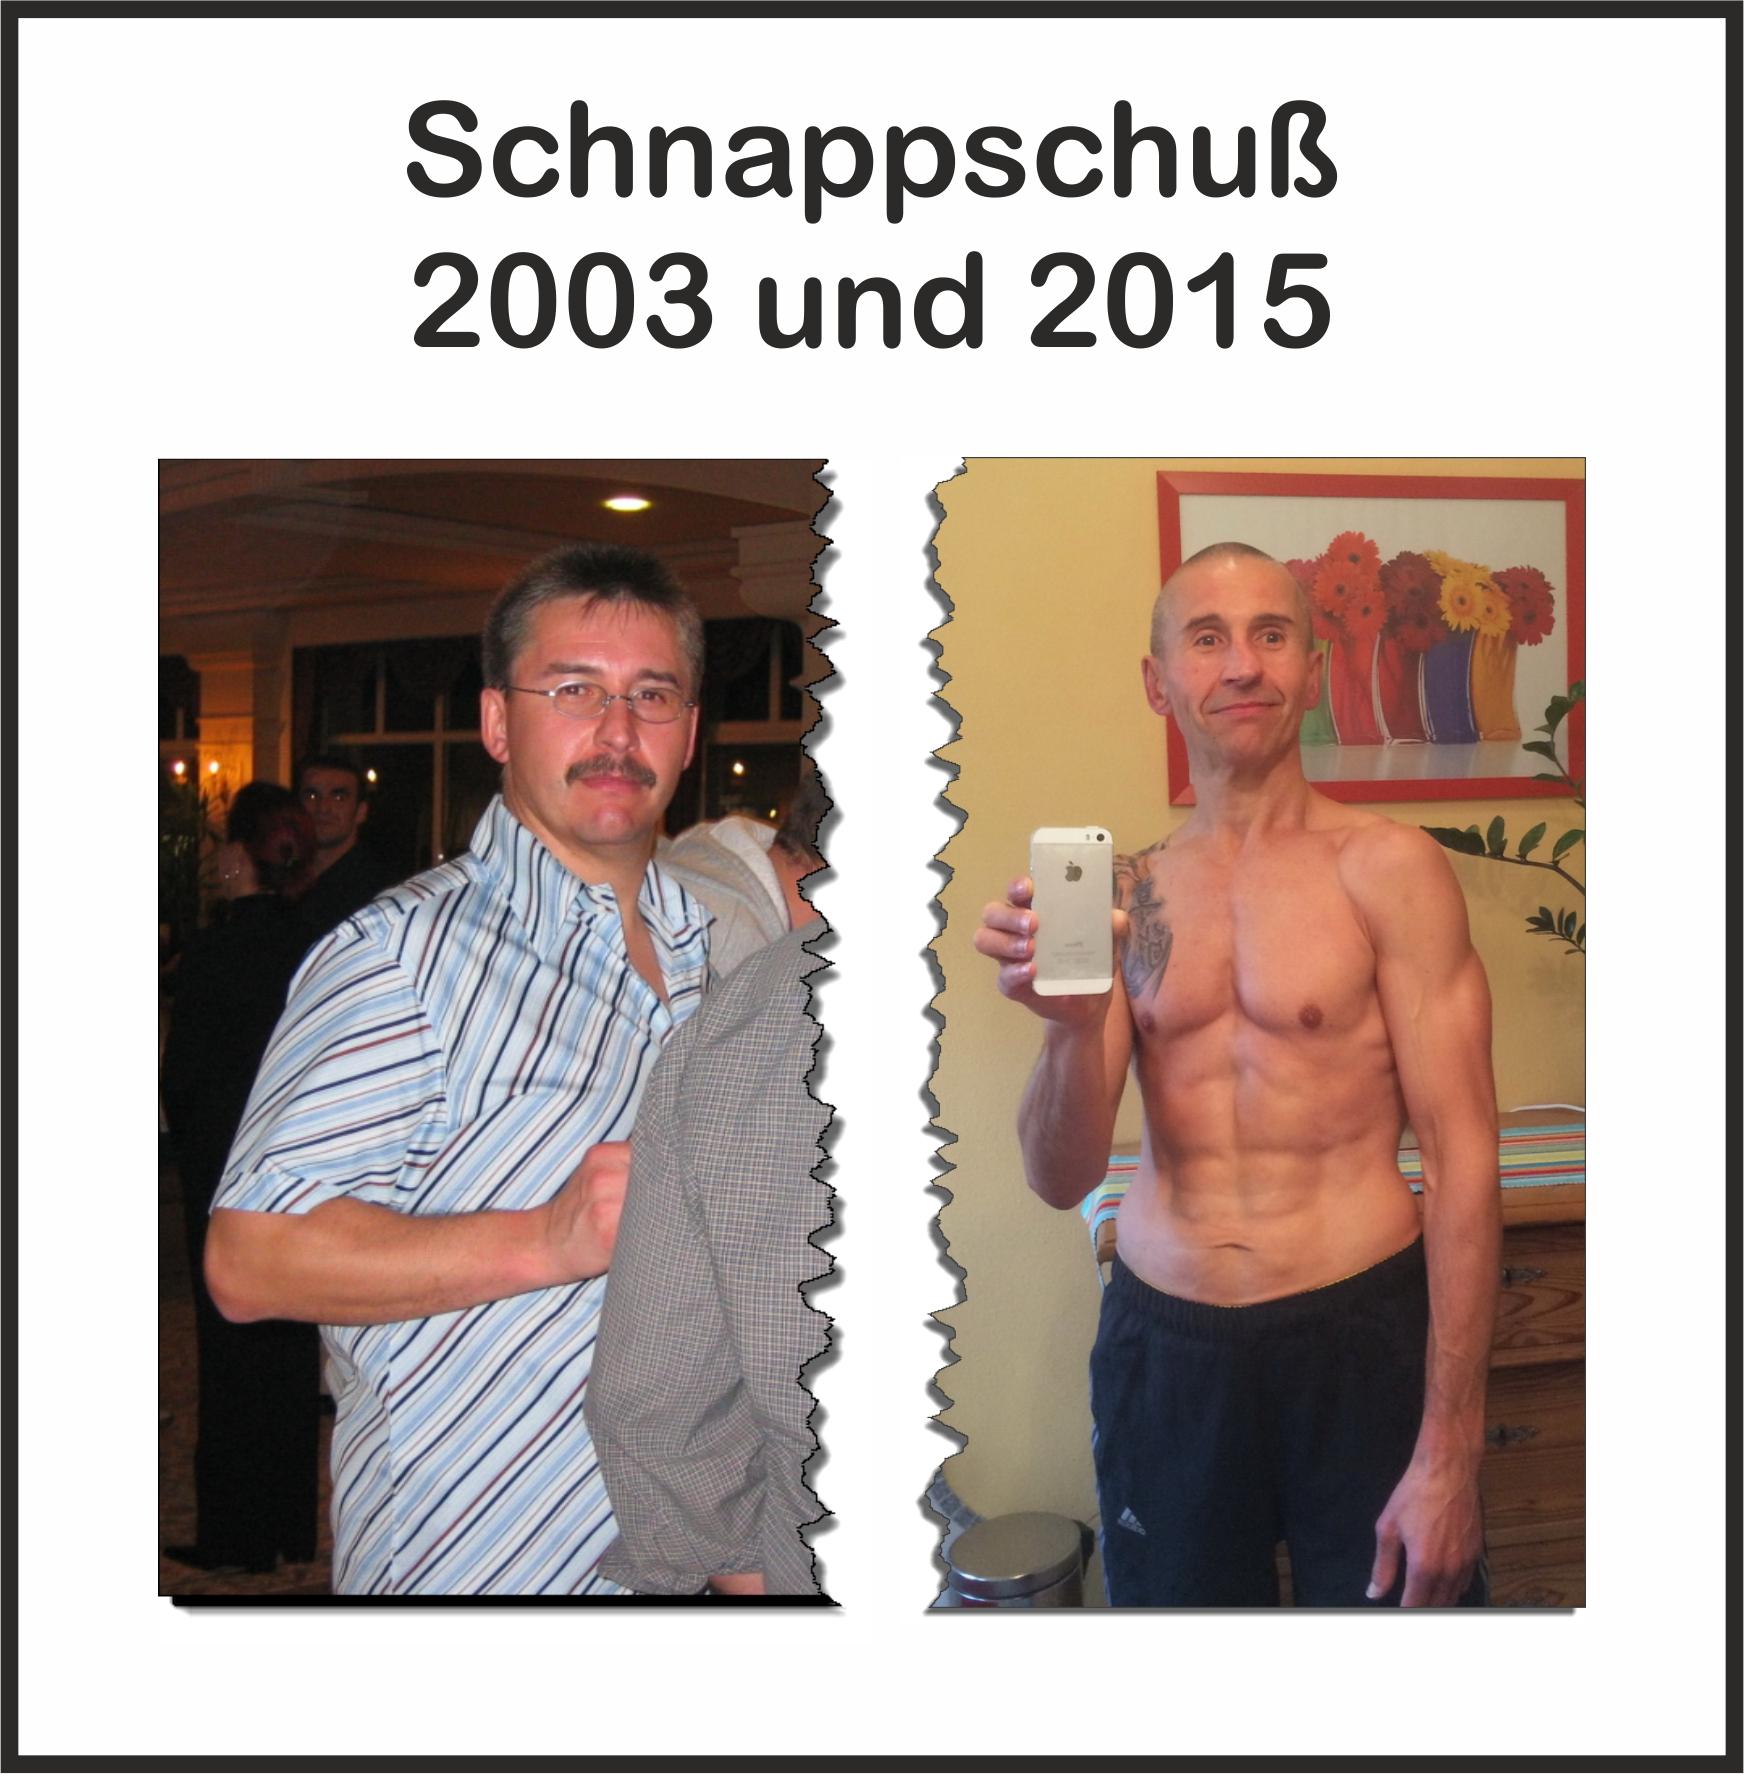 400_Schnappschuß_2003_2015